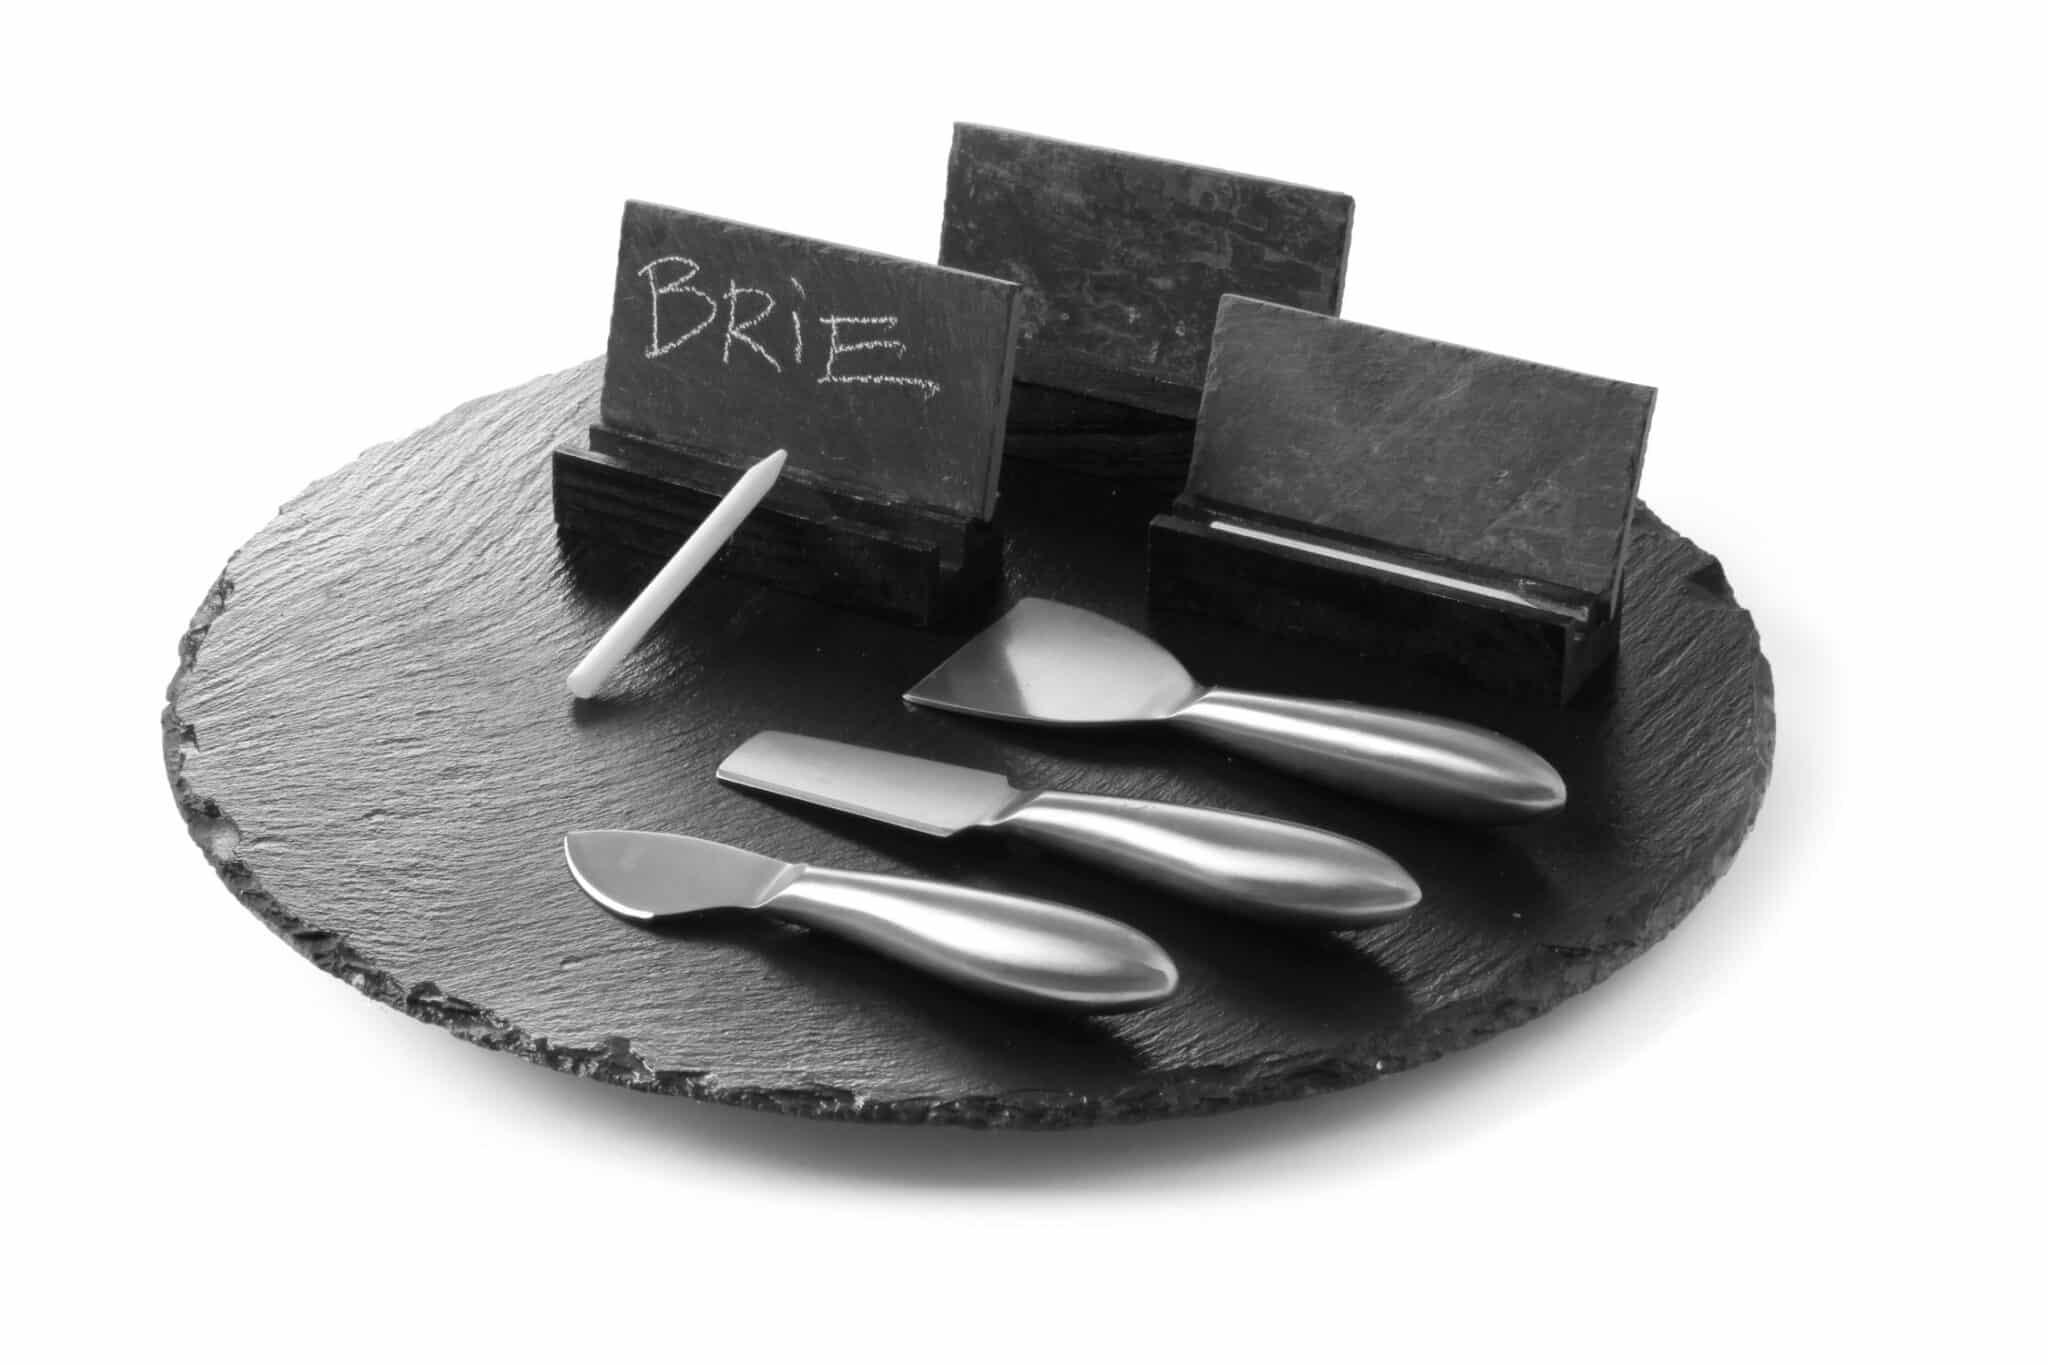 Schiefer-Platte Käseteller Kuchenteller Drehteller Set 13